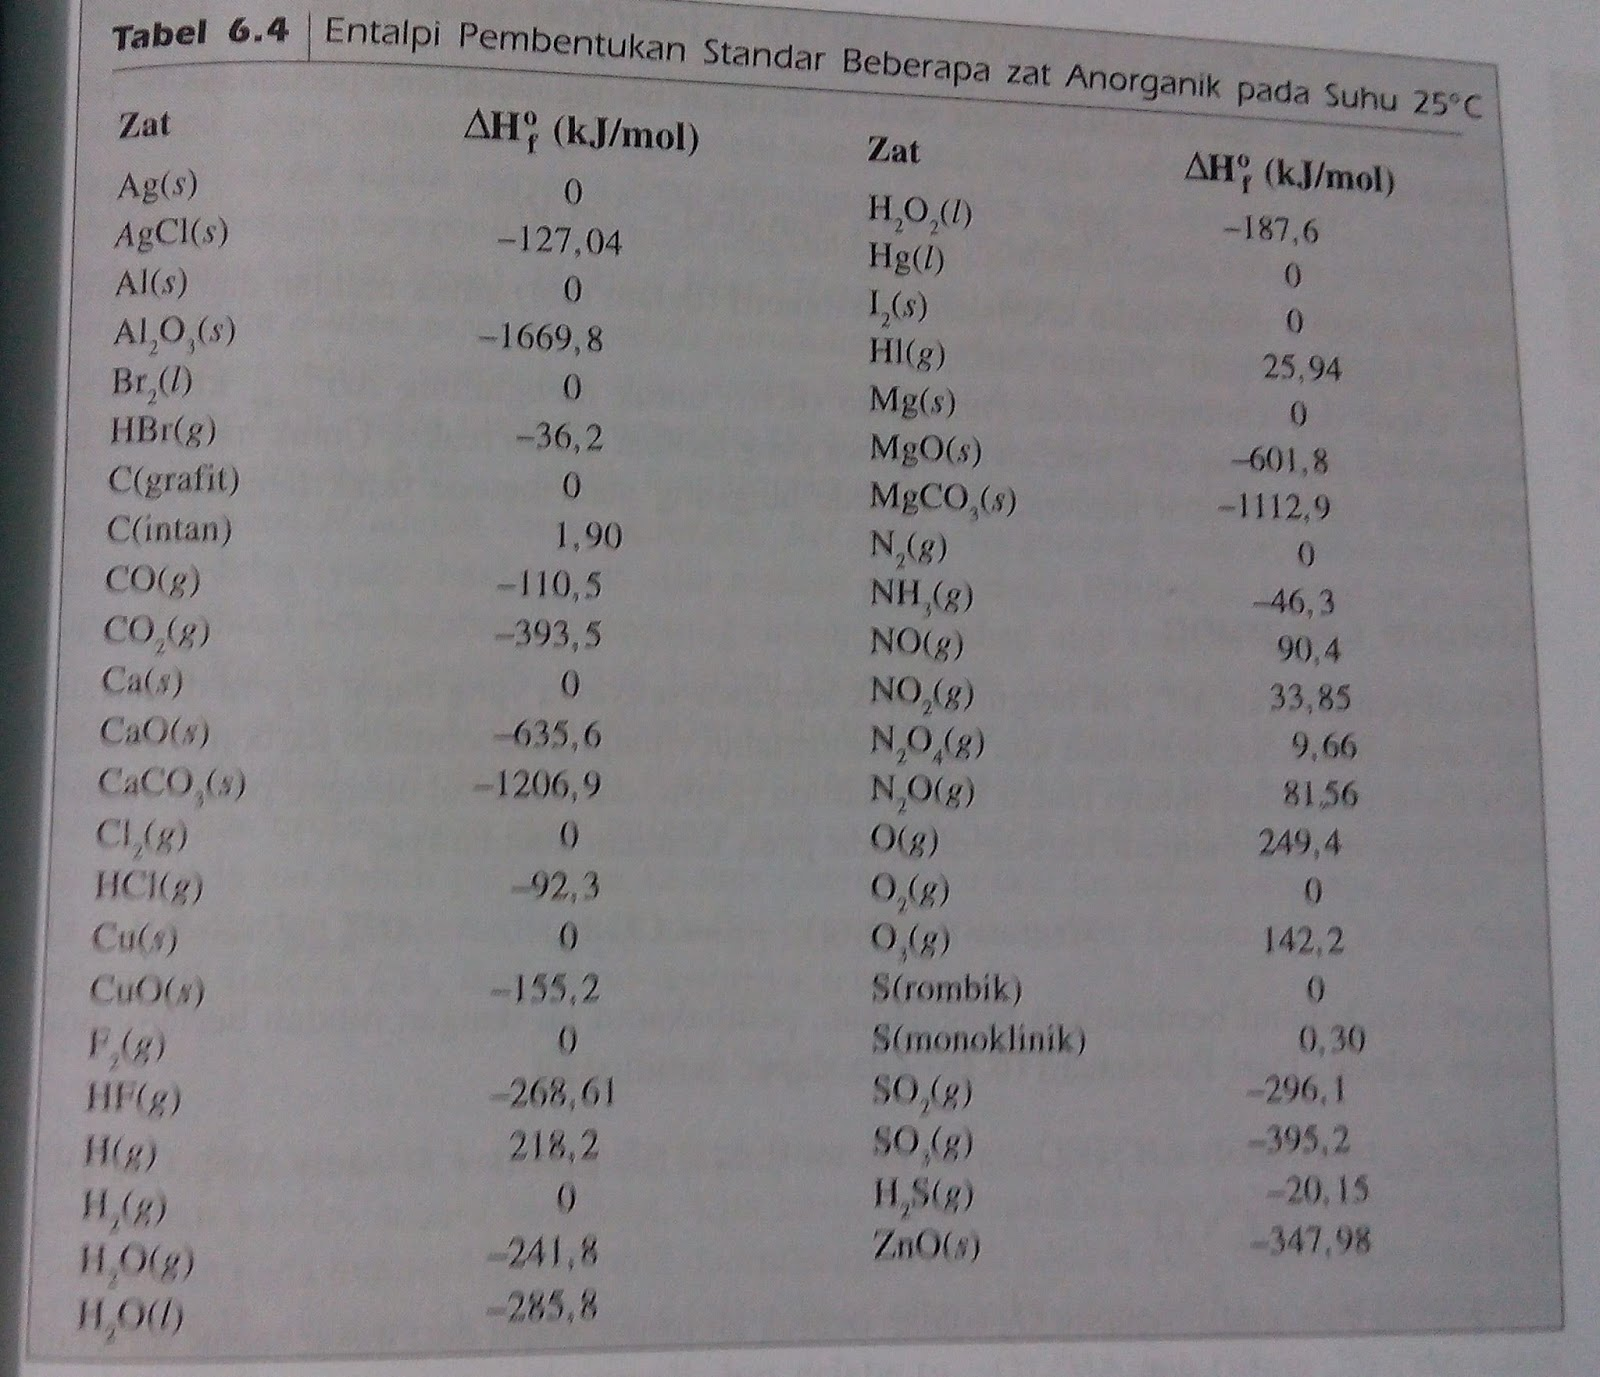 Kelas 11 Ipa Lihat Ini Termokimia Data Entalpi Pembentukan Standar Dan Beberapa Jenis Entalpi